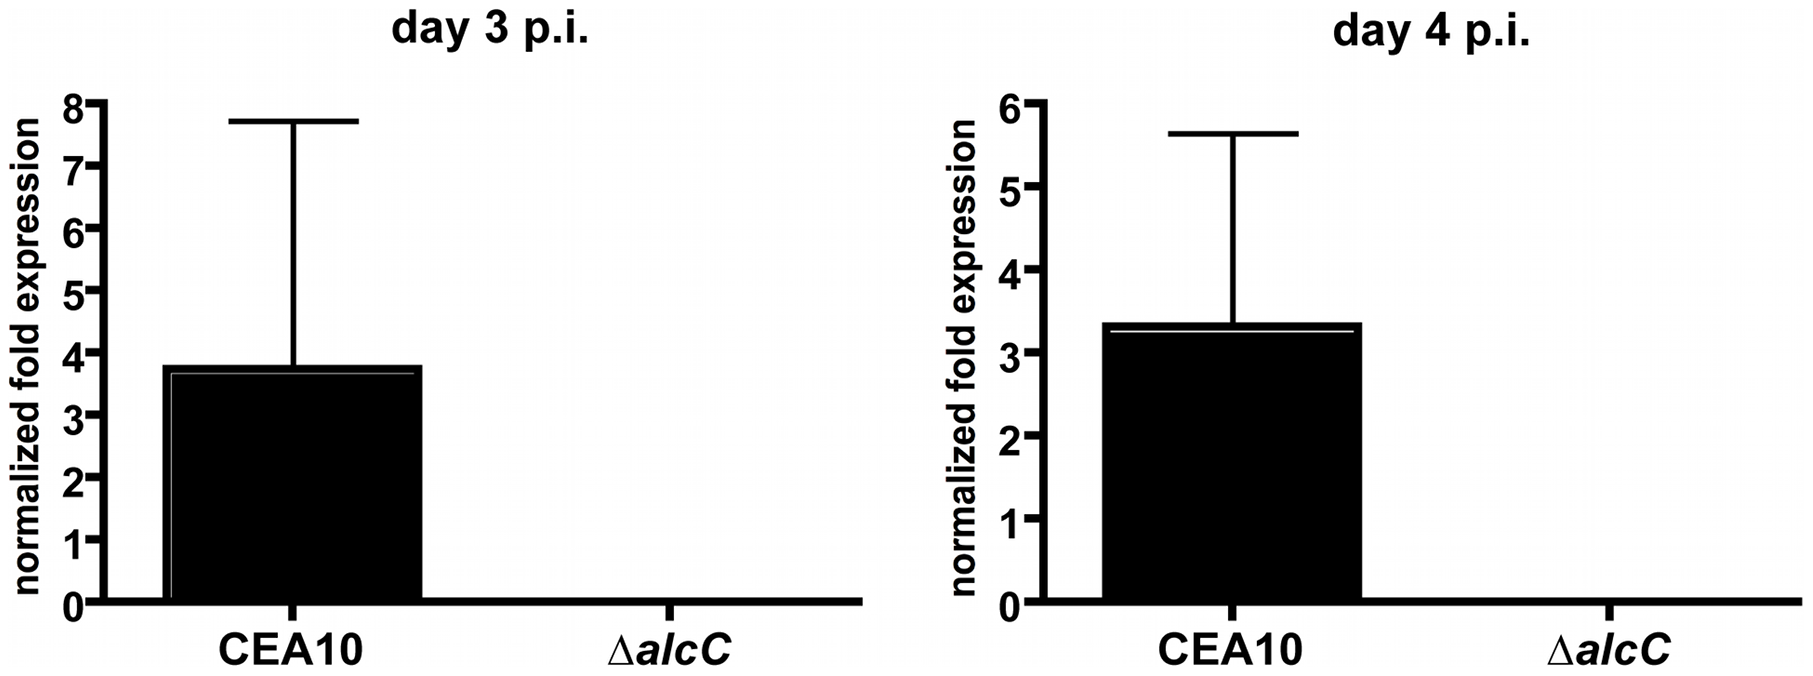 Normalized fold expression of the <i>A. fumigatus alcC</i> gene <i>in vivo</i> during fungal pathogenesis.